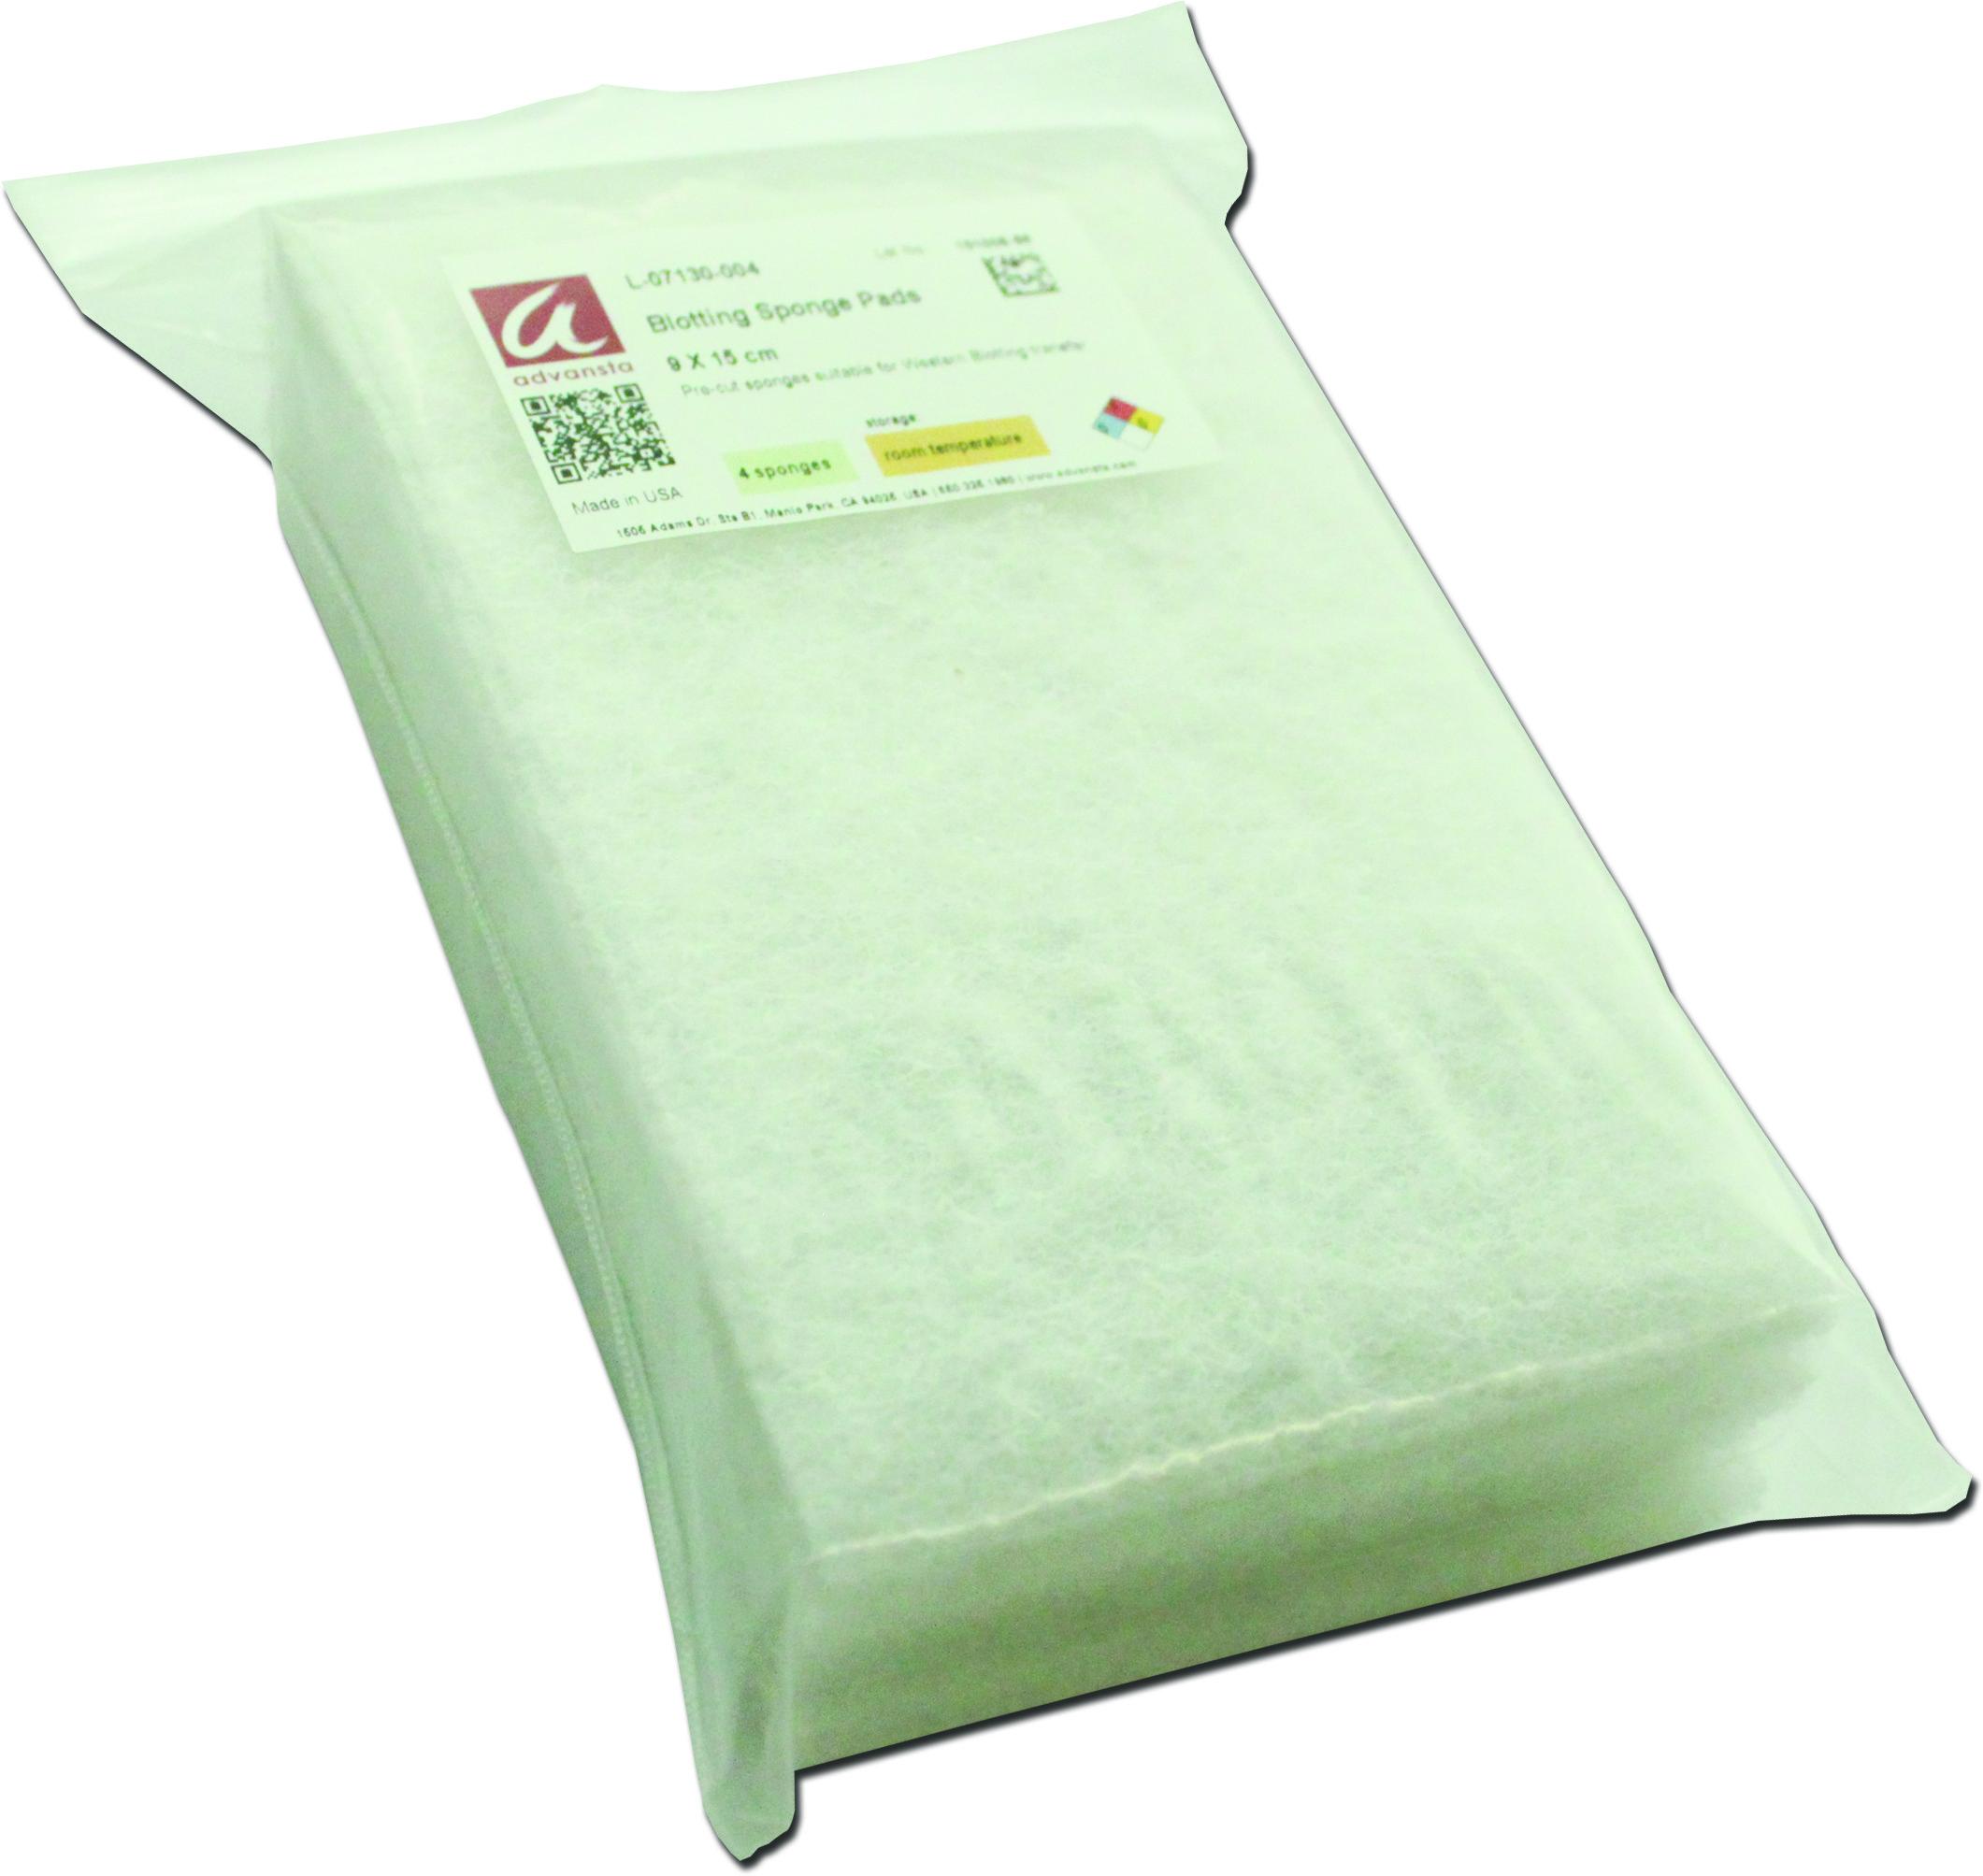 Blotting sponge pads